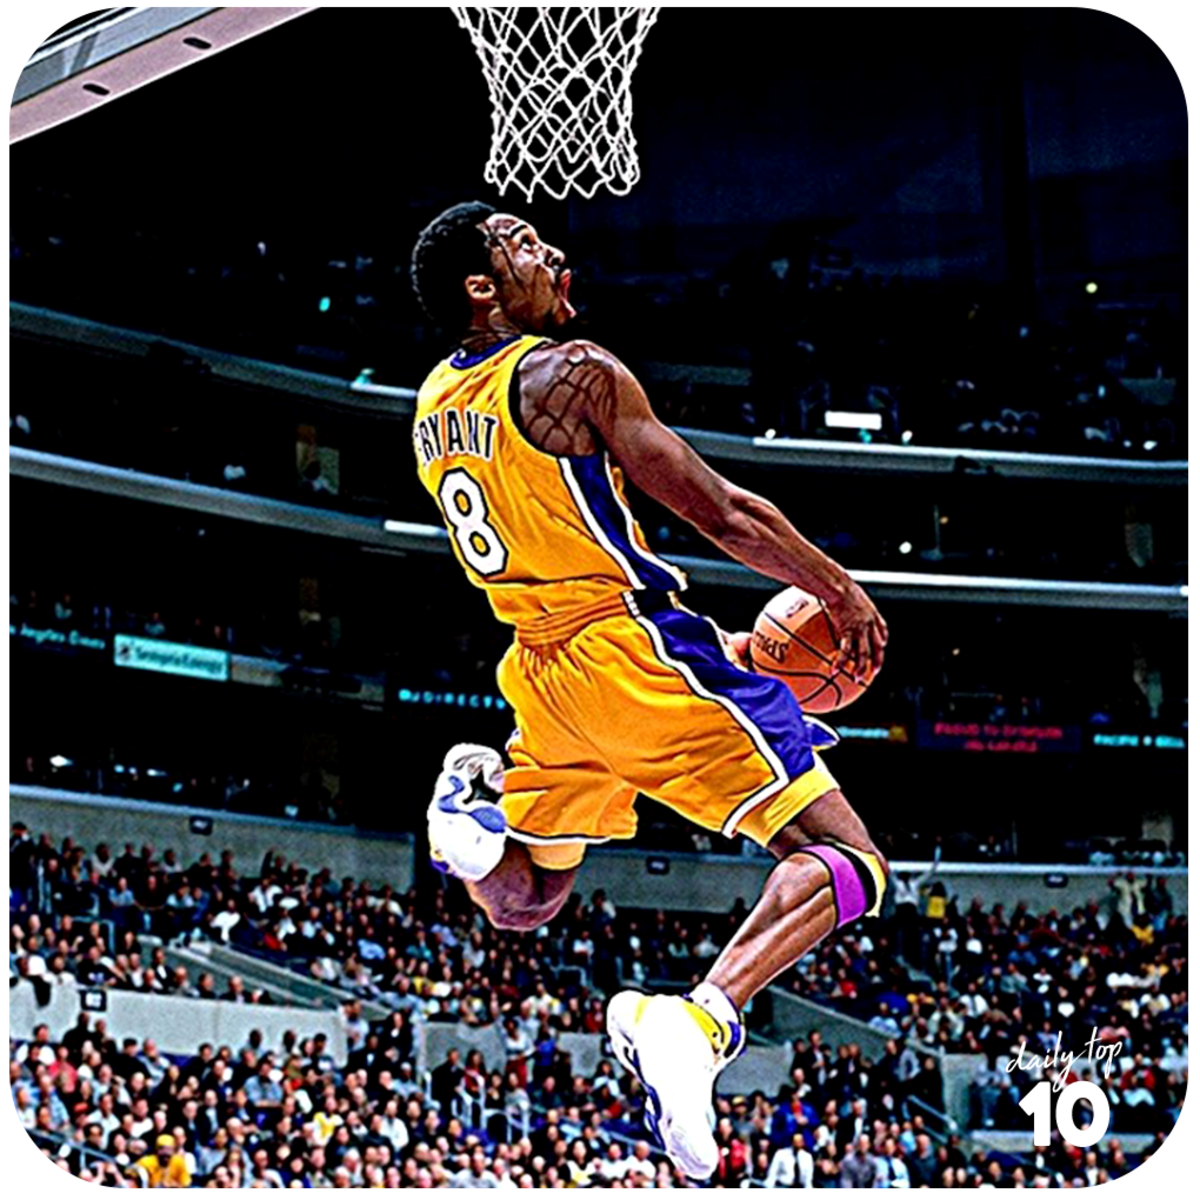 Kobe Bryant dunk.